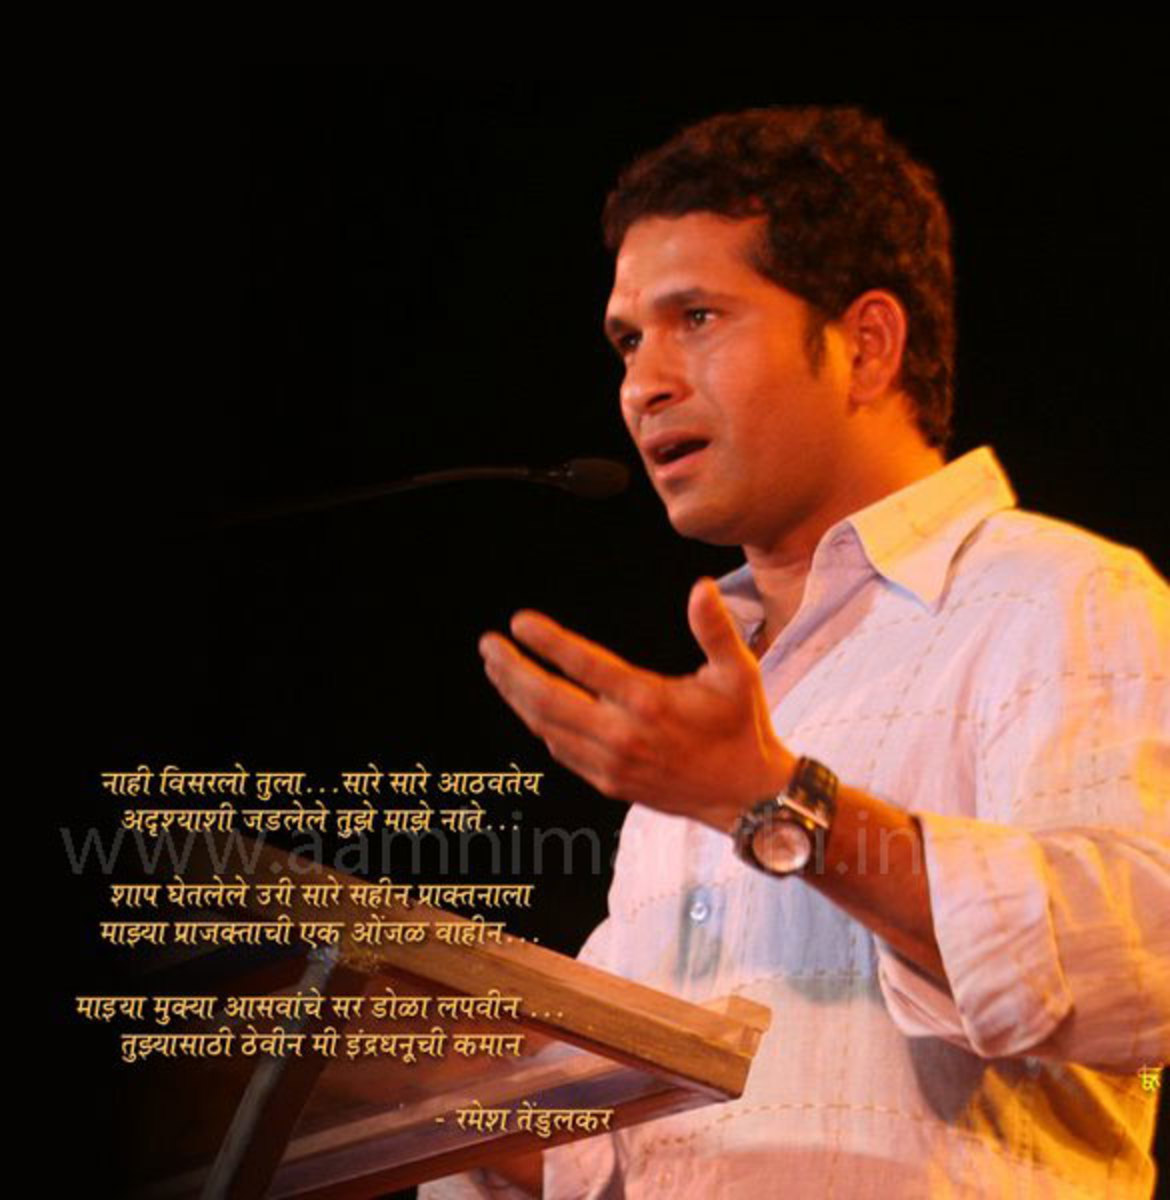 reciting something in Marathi